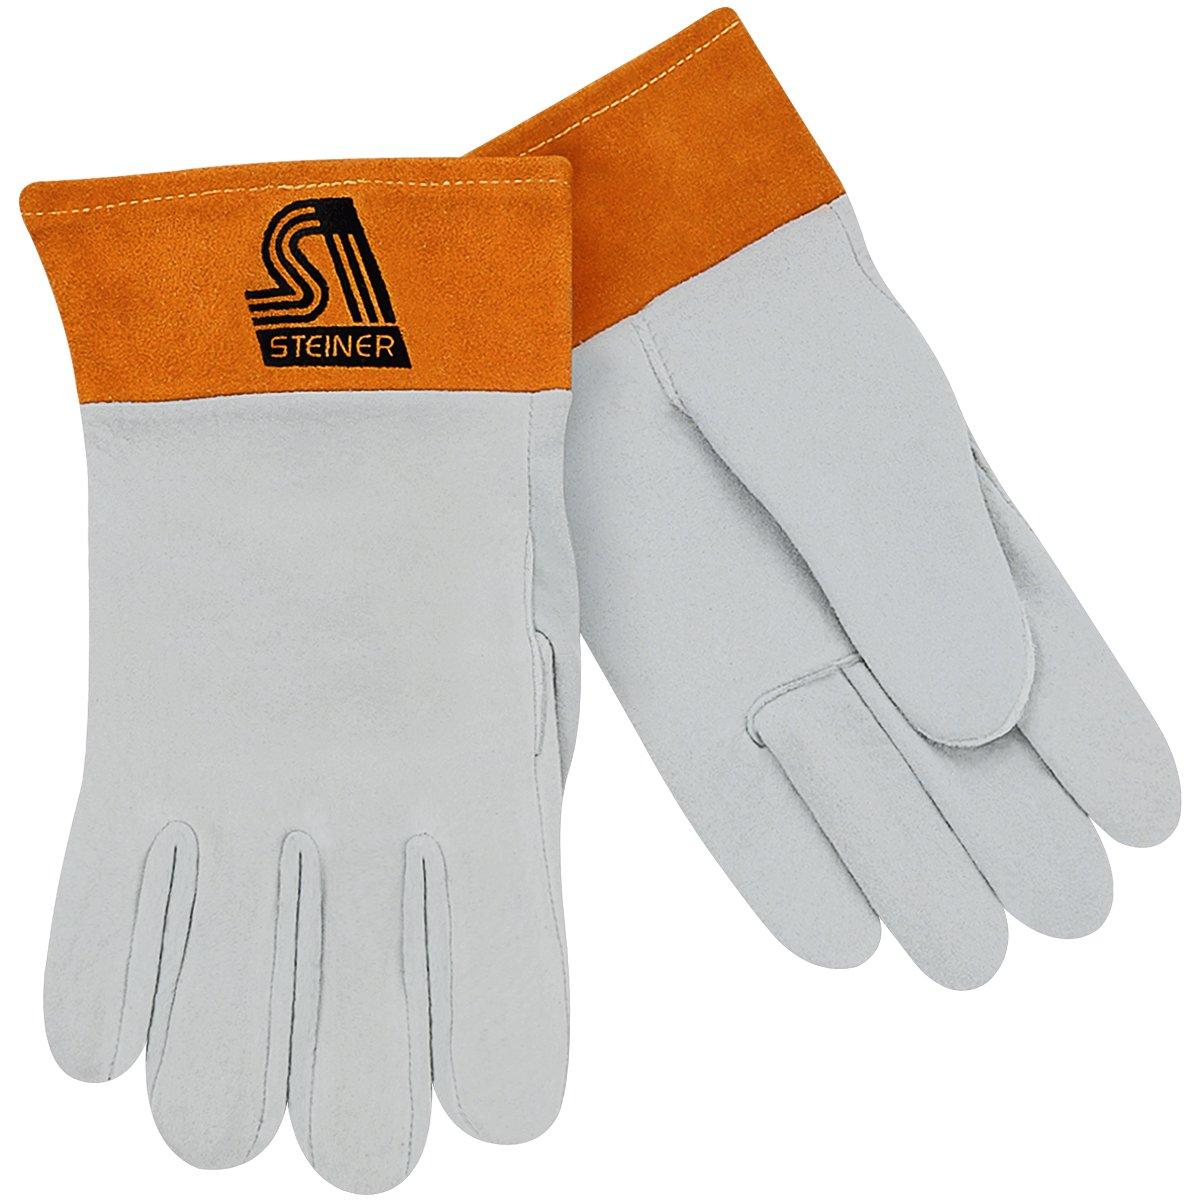 2-Inch Cuff Unlined Large Steiner 0221-L TIG Gloves Split Deerskin